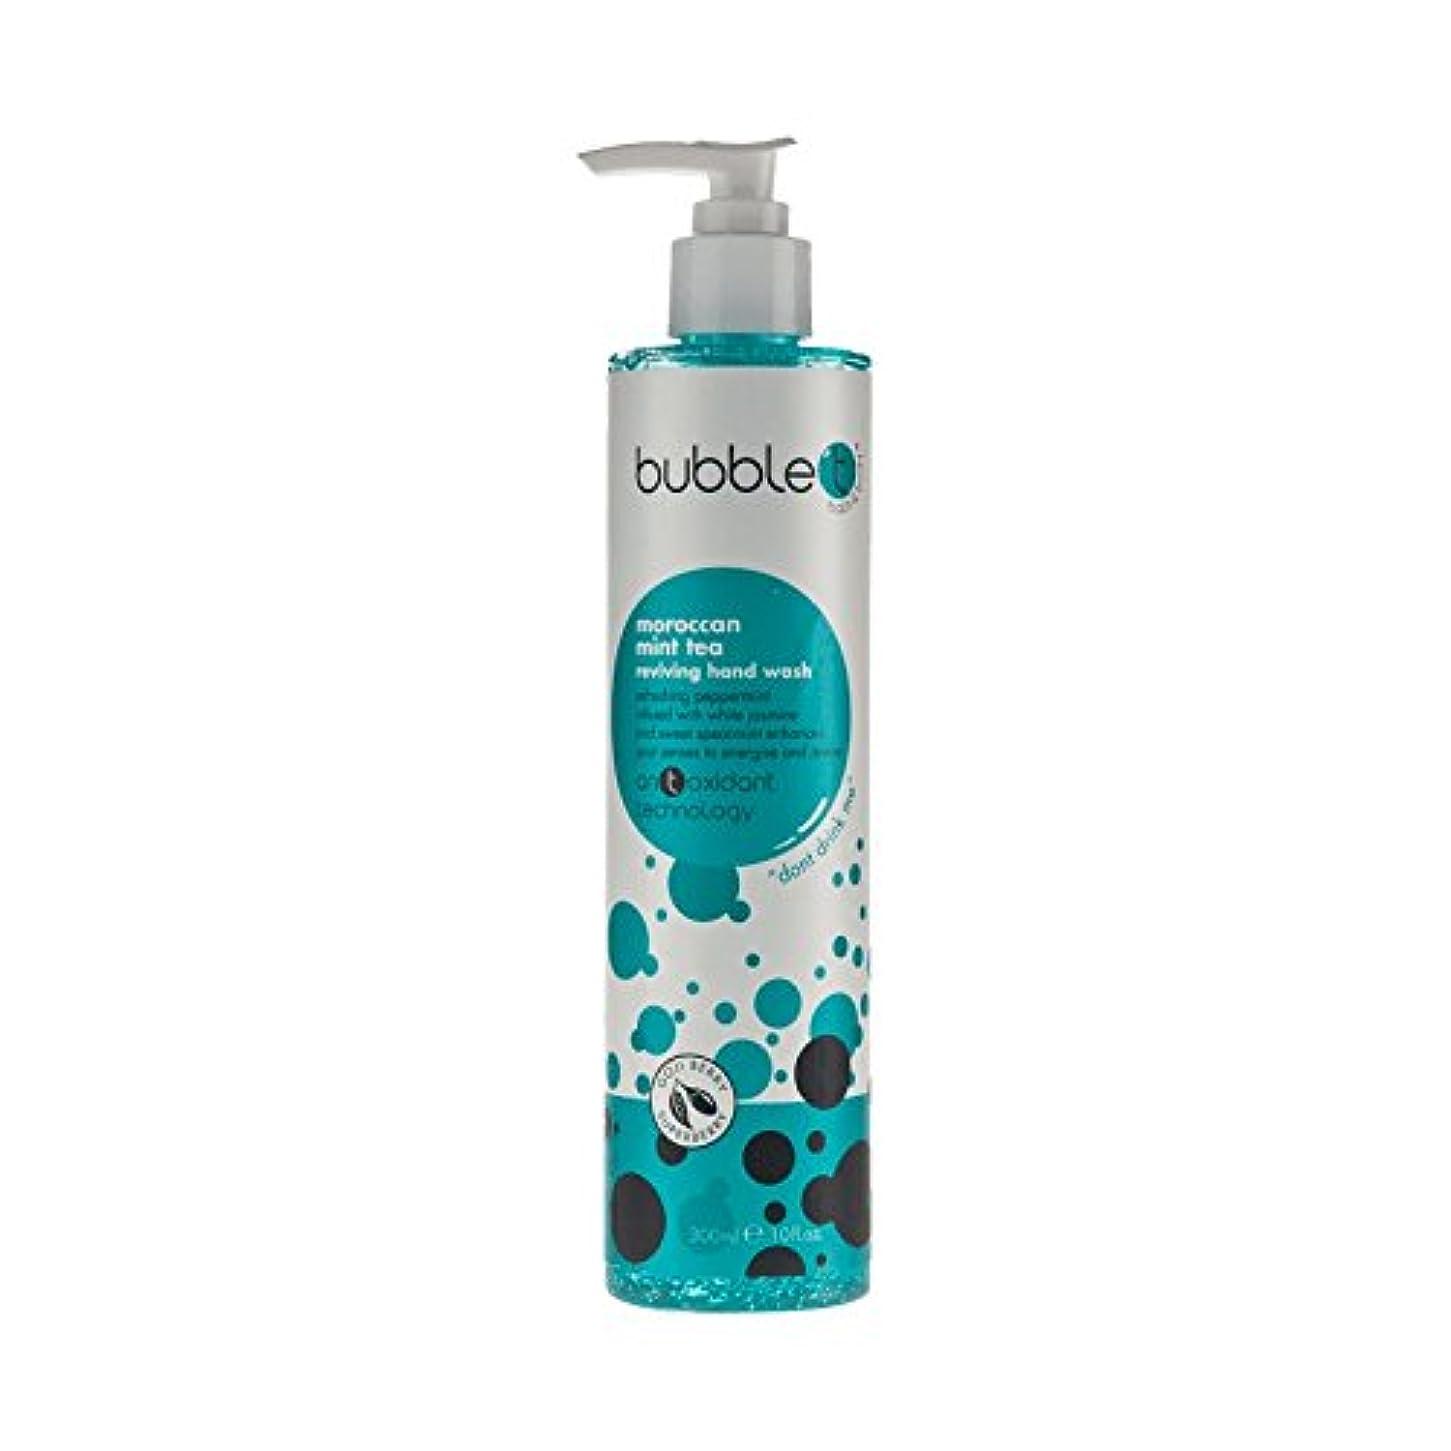 Bubble T Hand Wash Morrocan Mint 300ml (Pack of 6) - バブルトン手洗いモロッコミント300ミリリットル (x6) [並行輸入品]